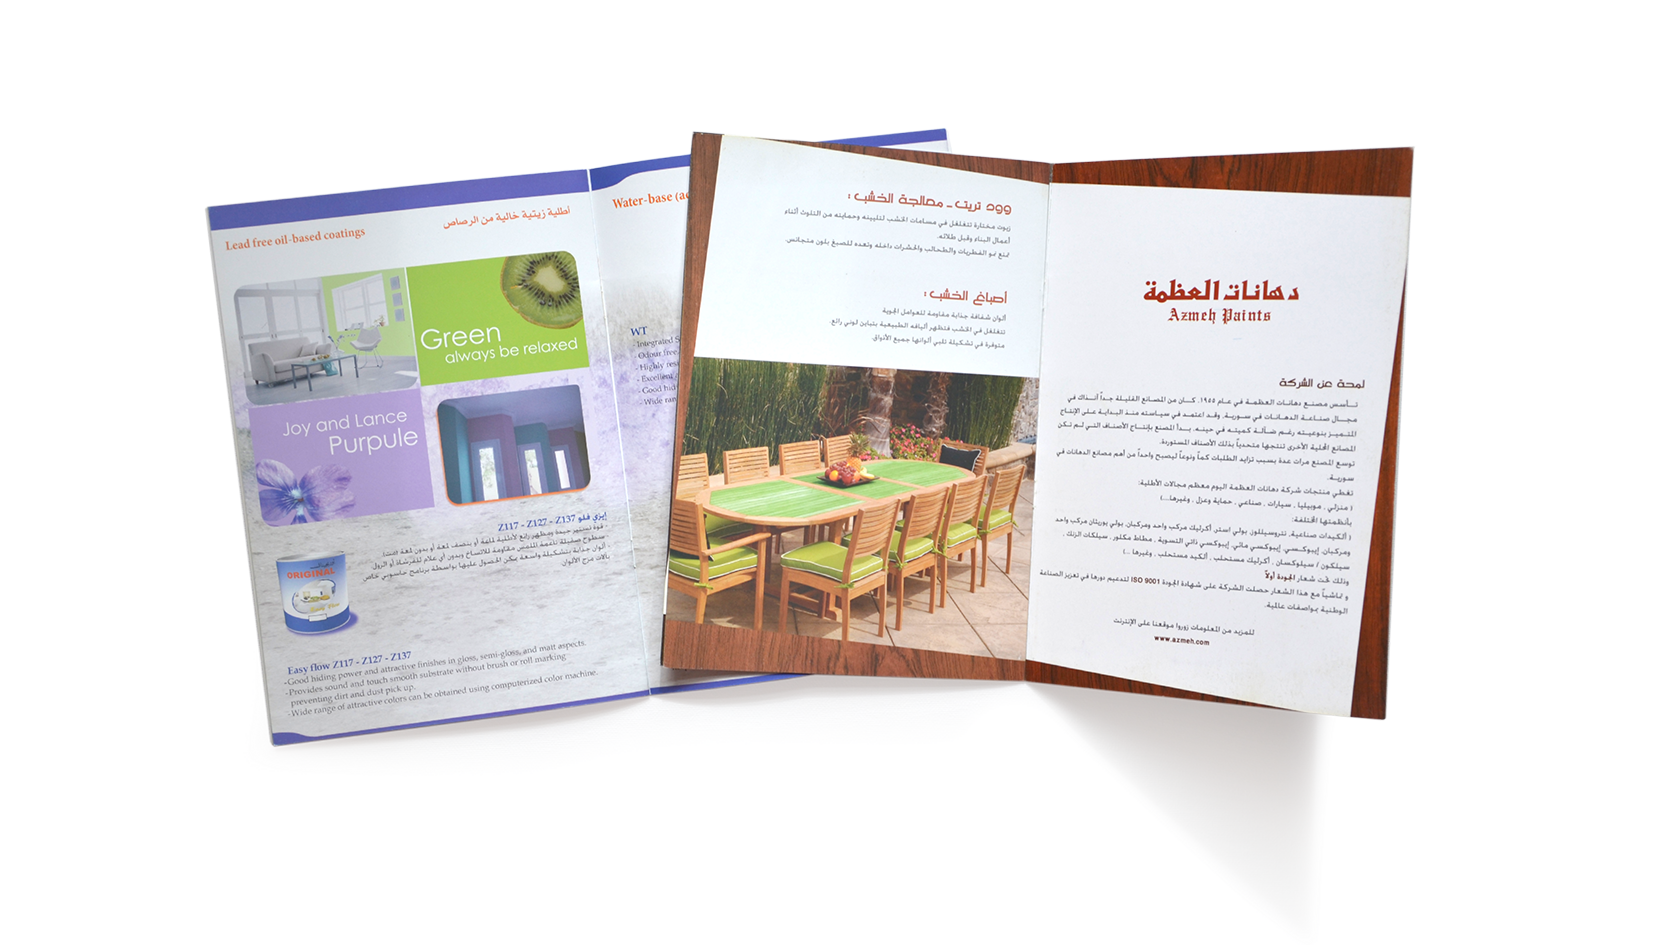 Nour, Alnader, Portfolio, Katalog, Broschüre, Azmeh, Paint, Gestaltung, Layout, Info Grafik, Design, Illustration